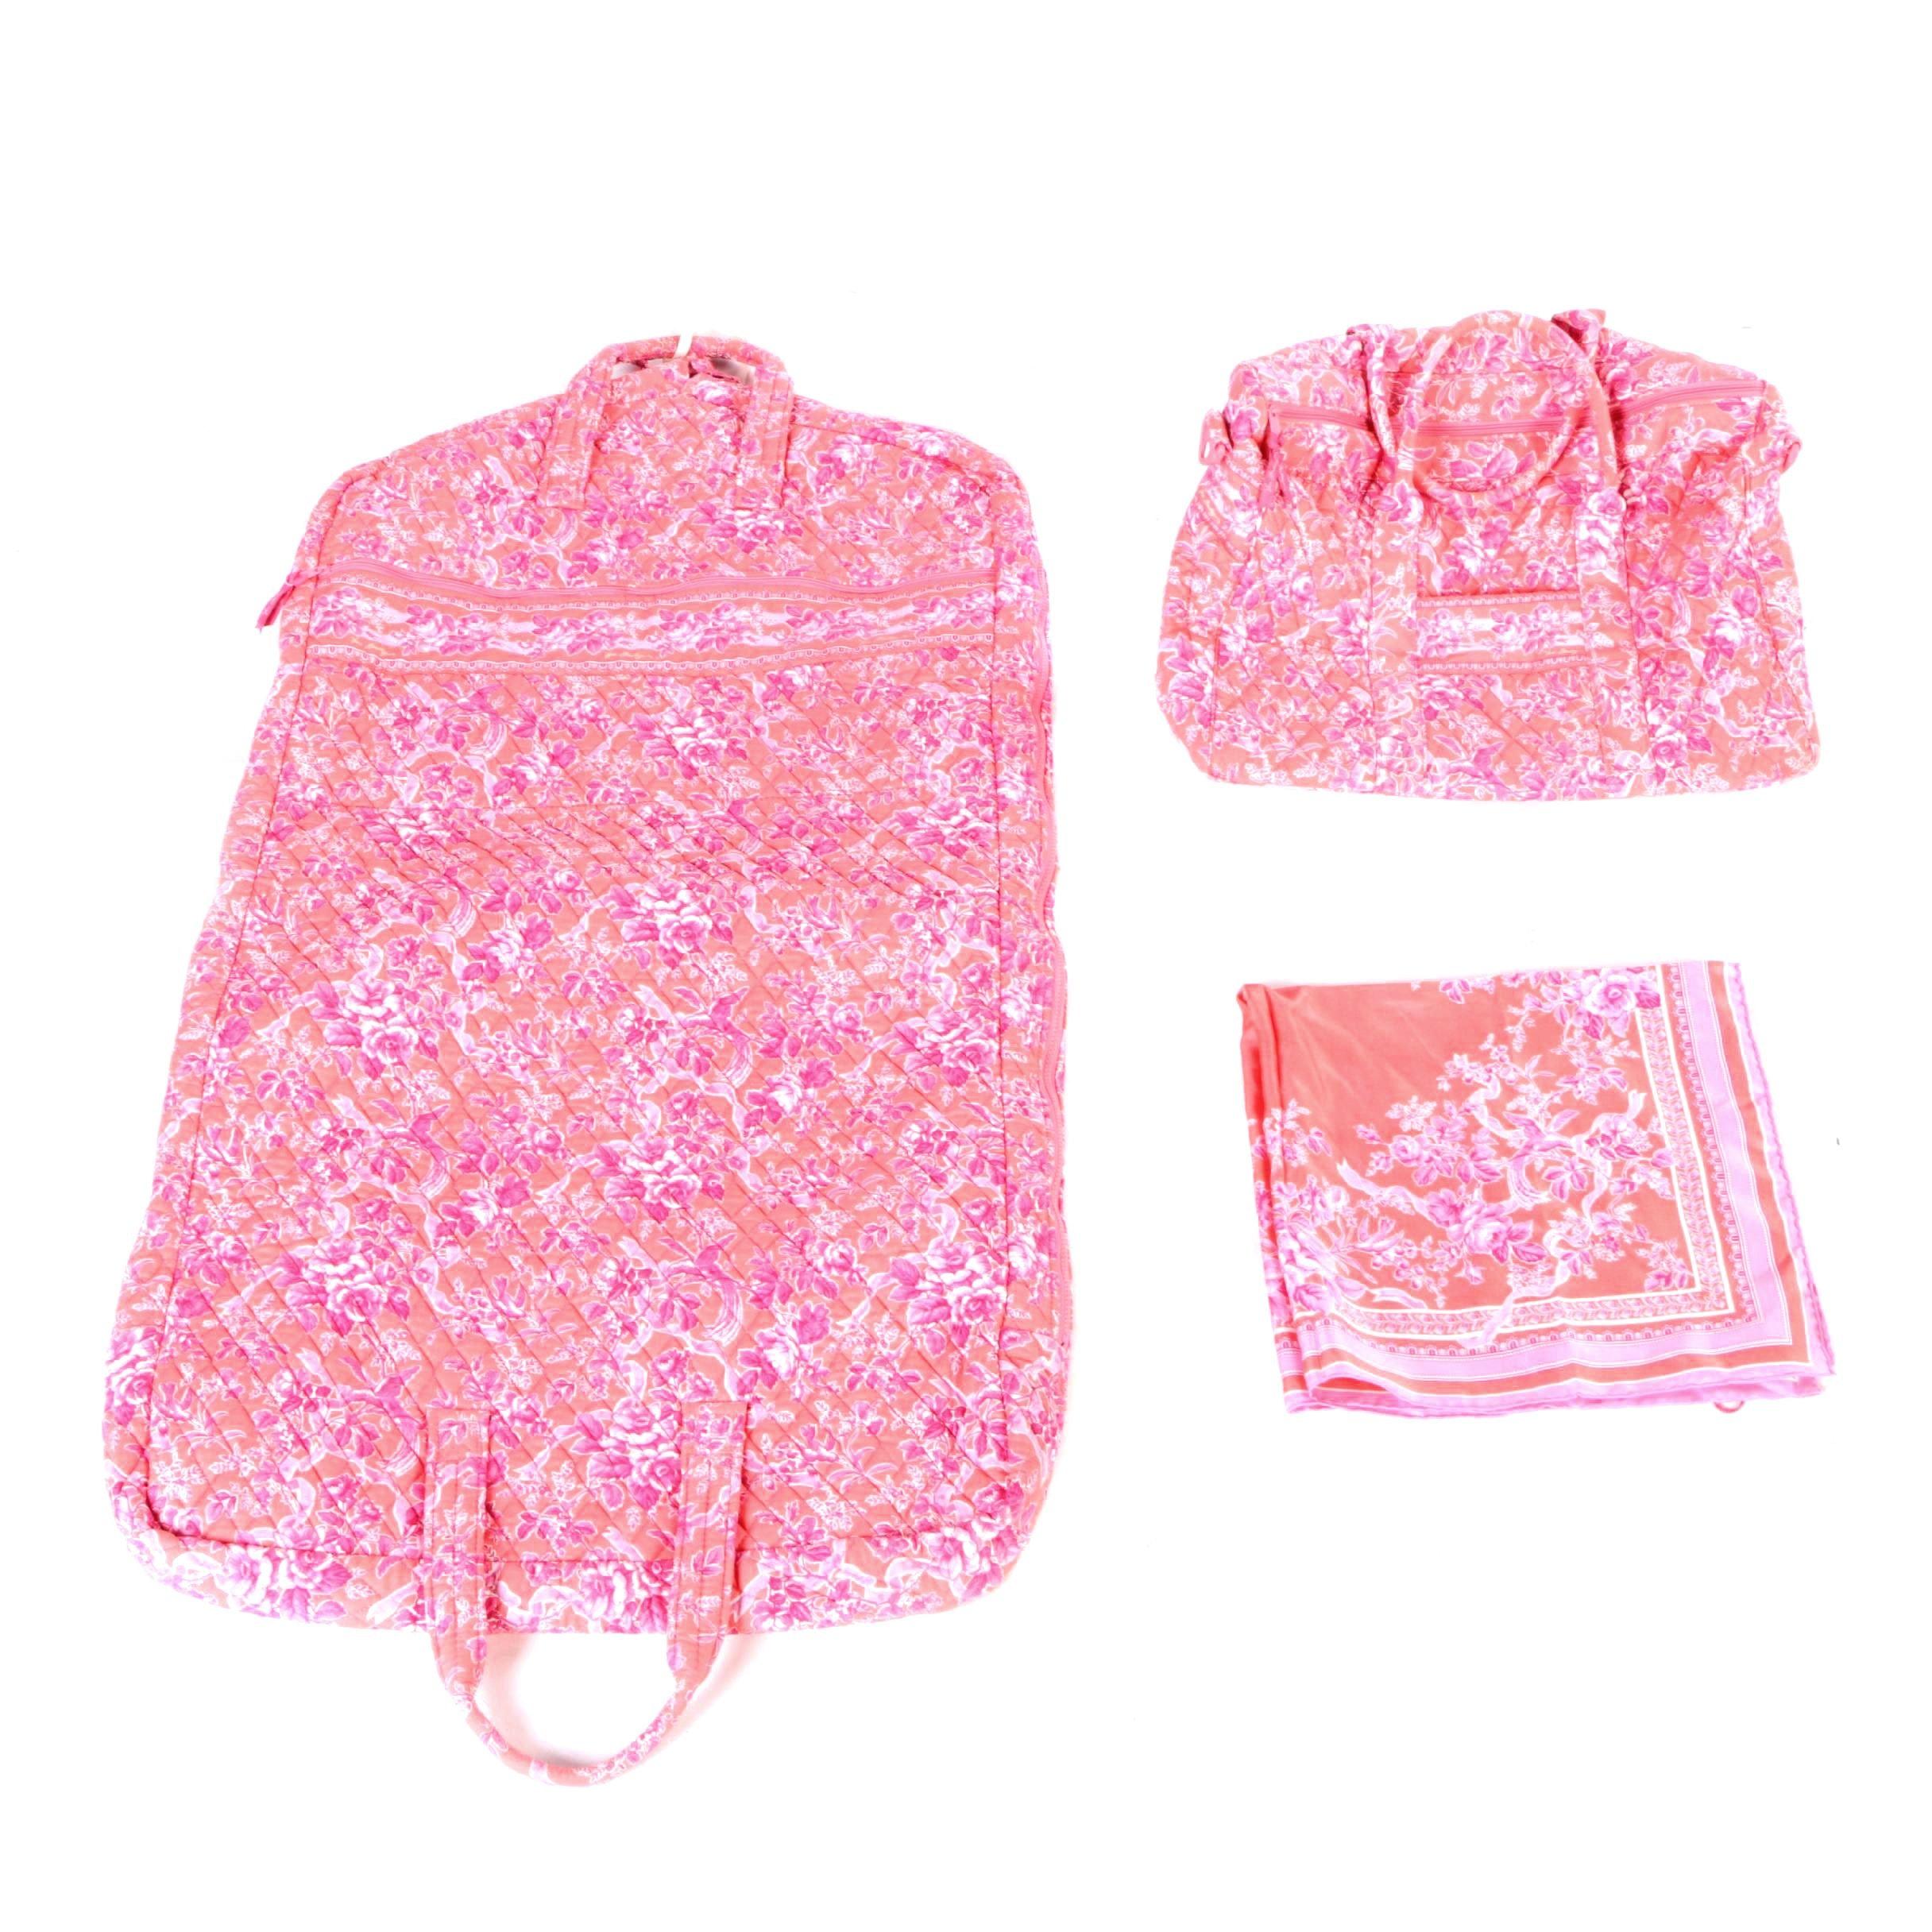 Vera Bradley Garment Bag, Duffle and Scarf